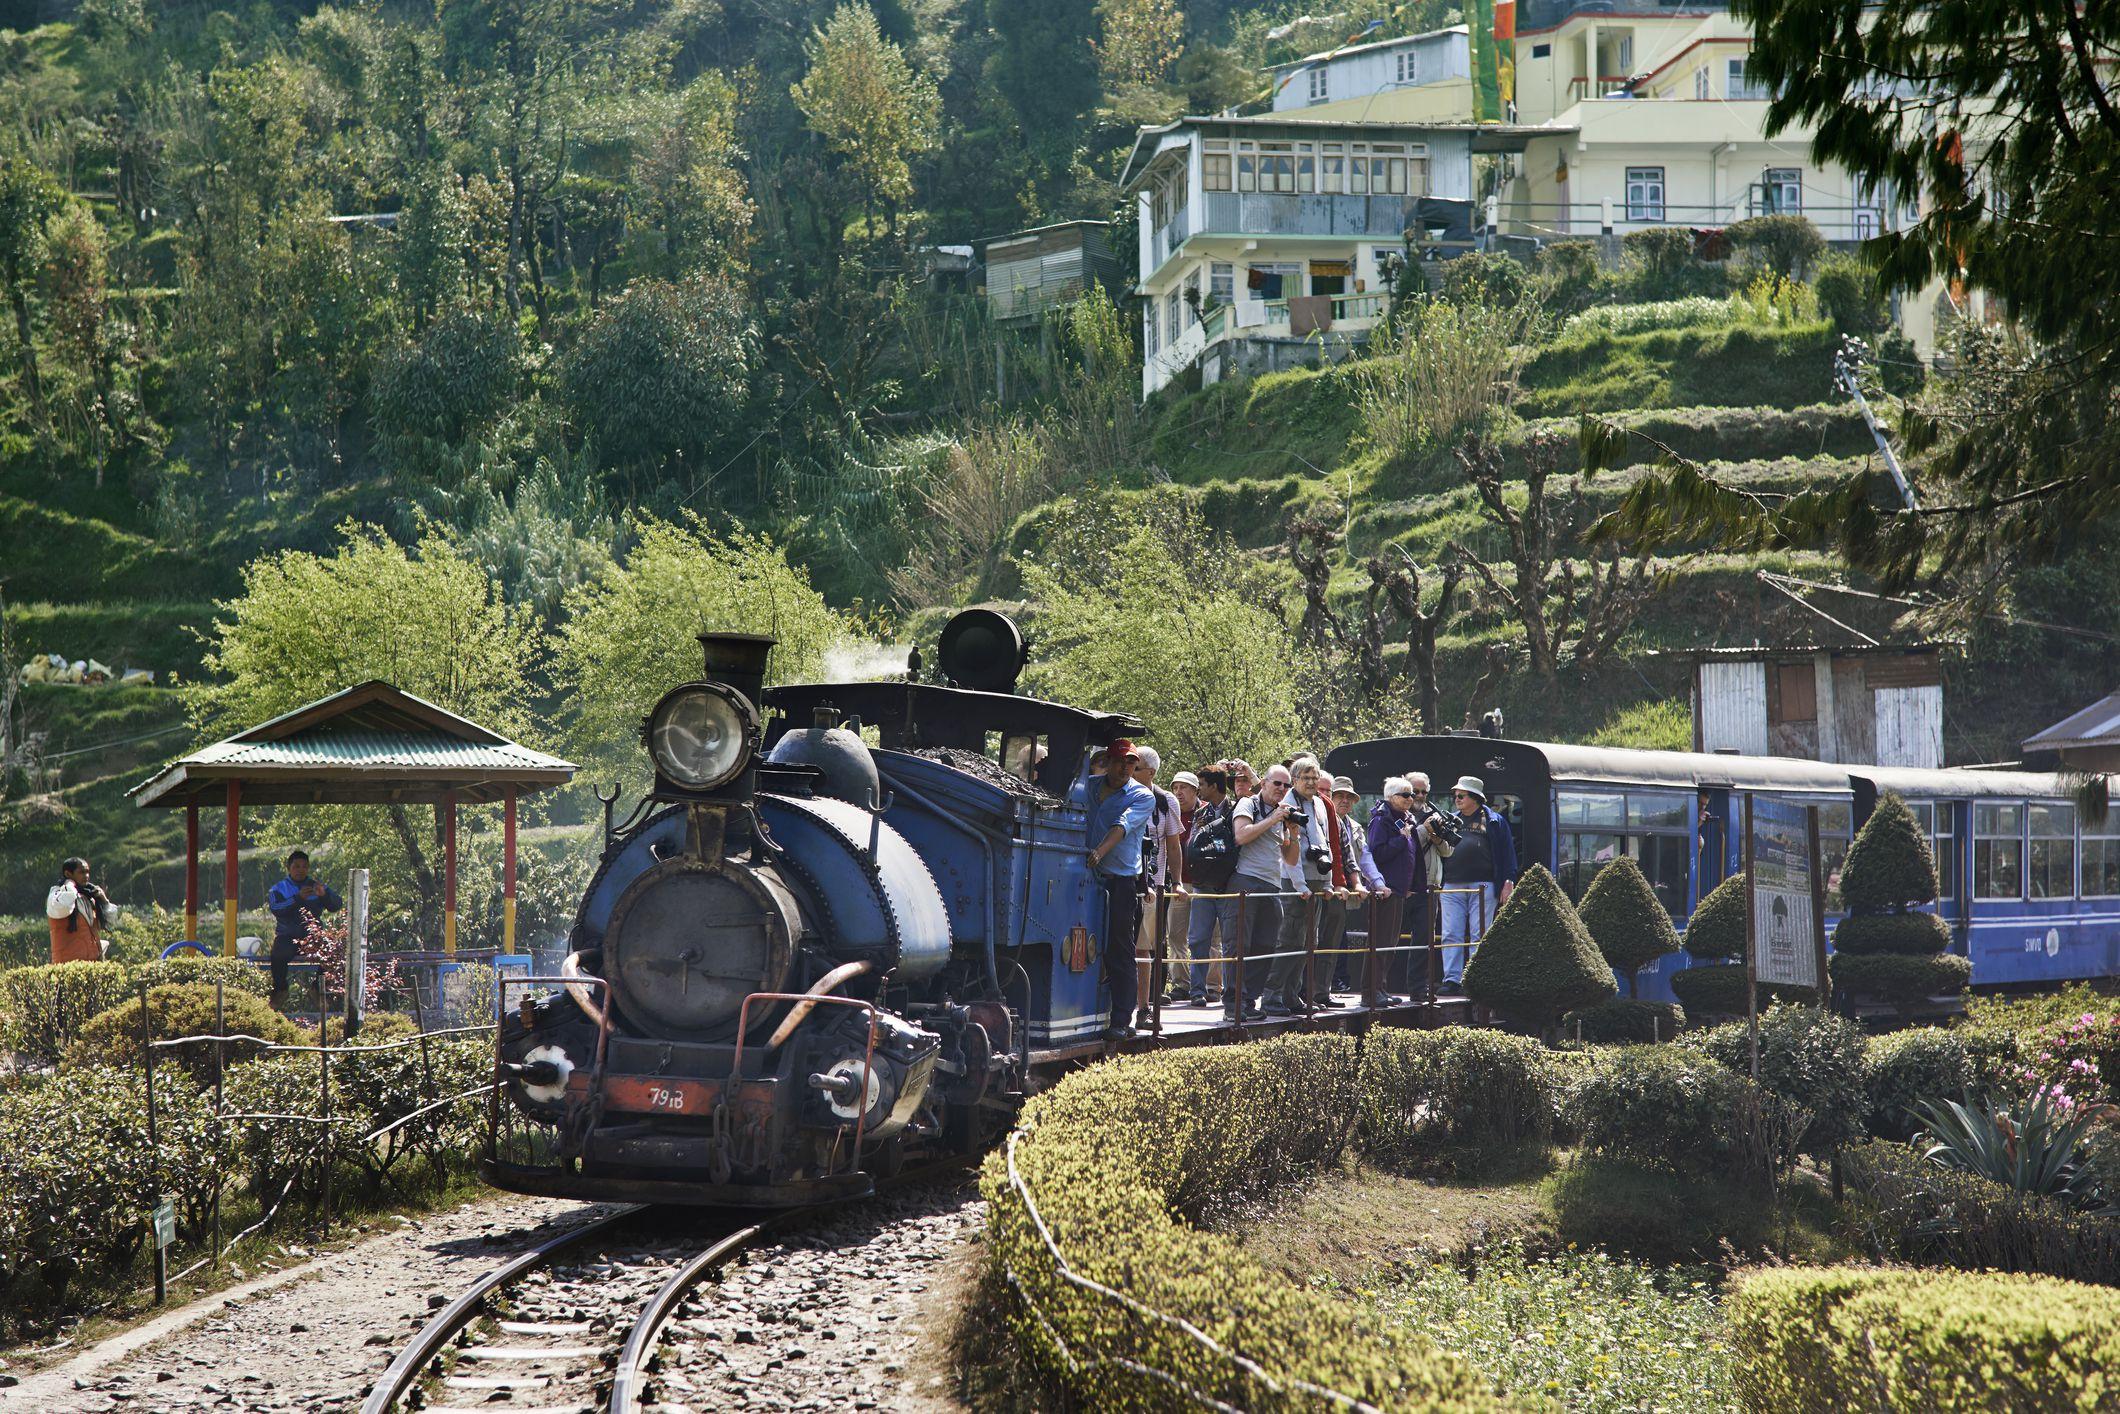 Steam Train enthusiasts on the Darjeeling Toy Trai